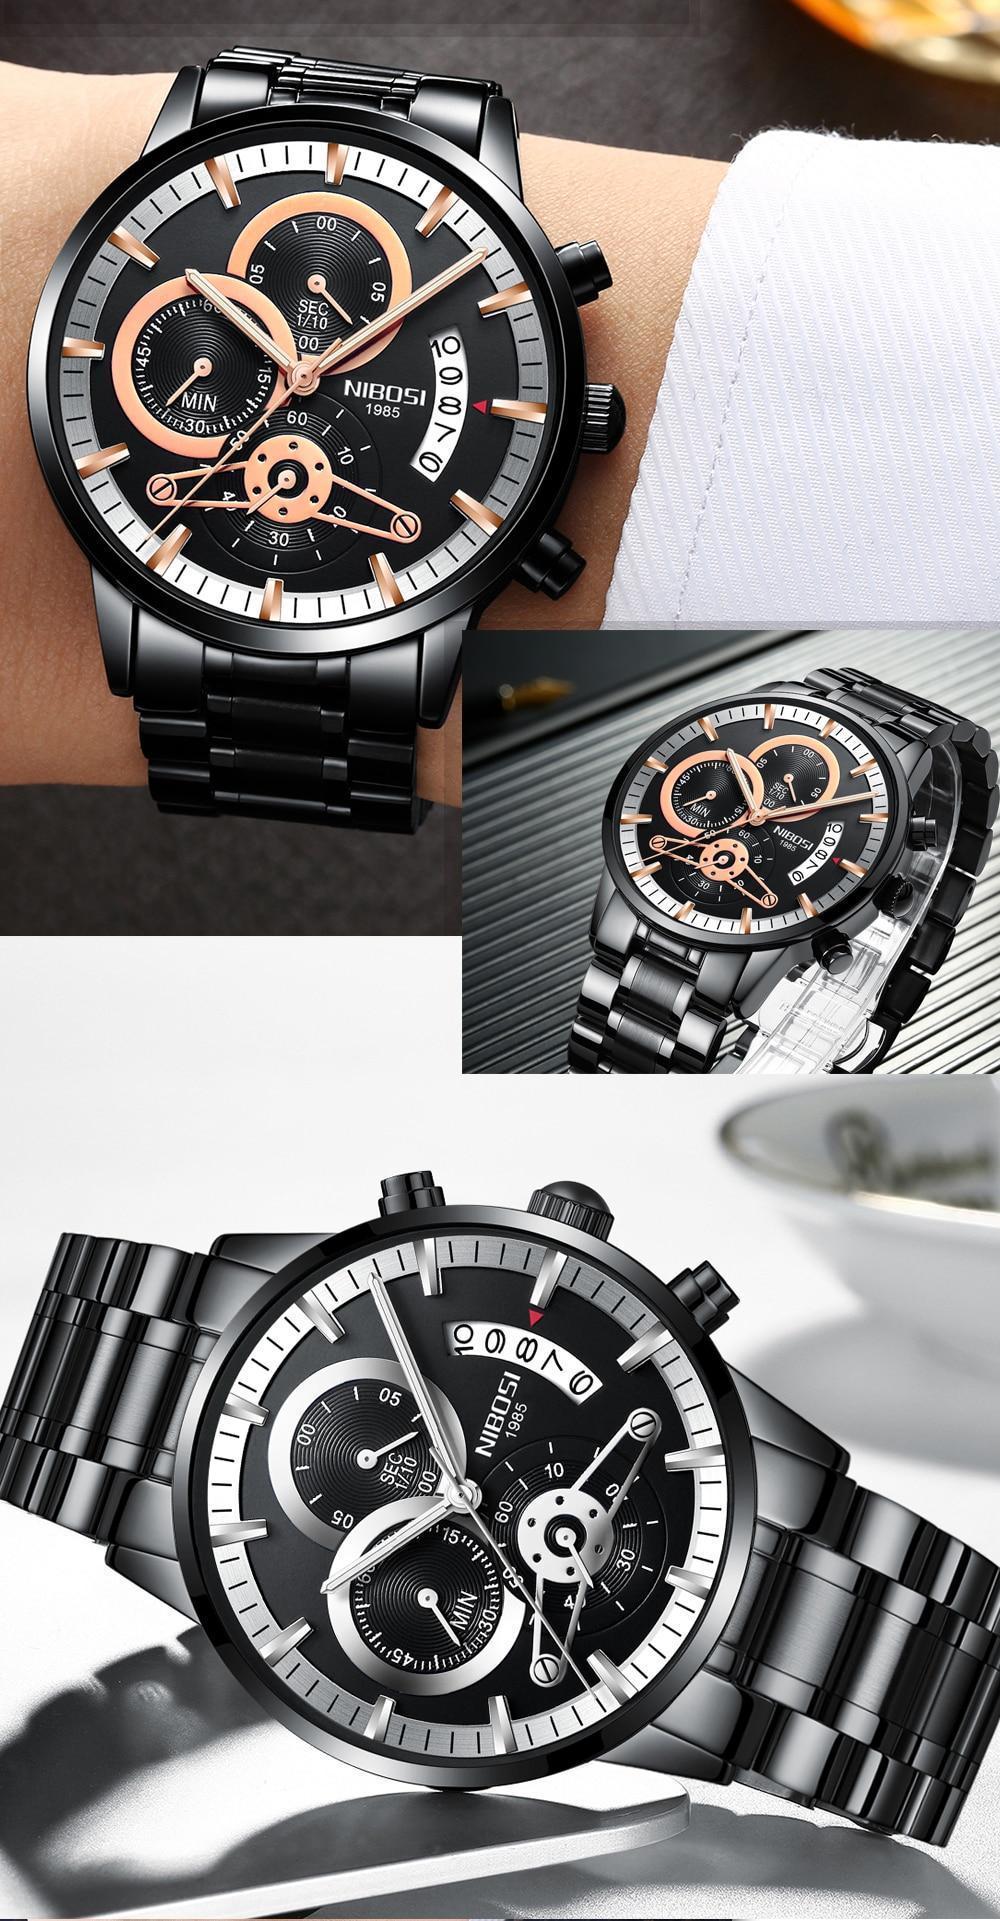 Relogio Masculino NIBOSI Luxury Men's Wristwatches Stainless Steel Sport Clock Man Gold Male Watches Top Brand Business Watch  (8)